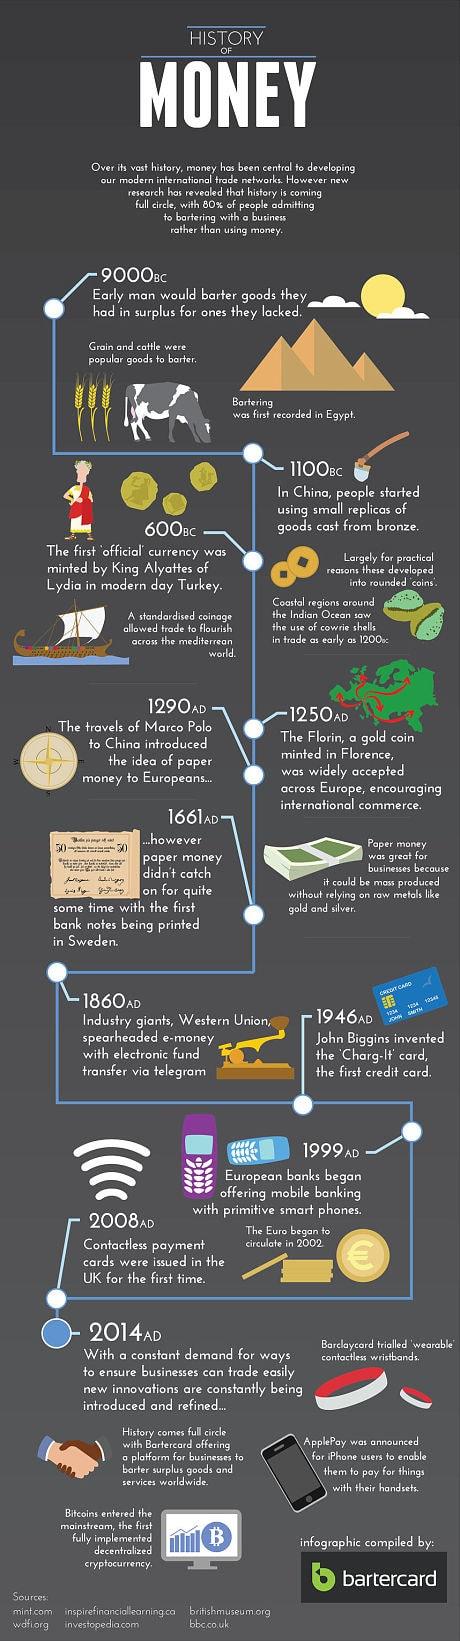 the_history_of_money_3078442c